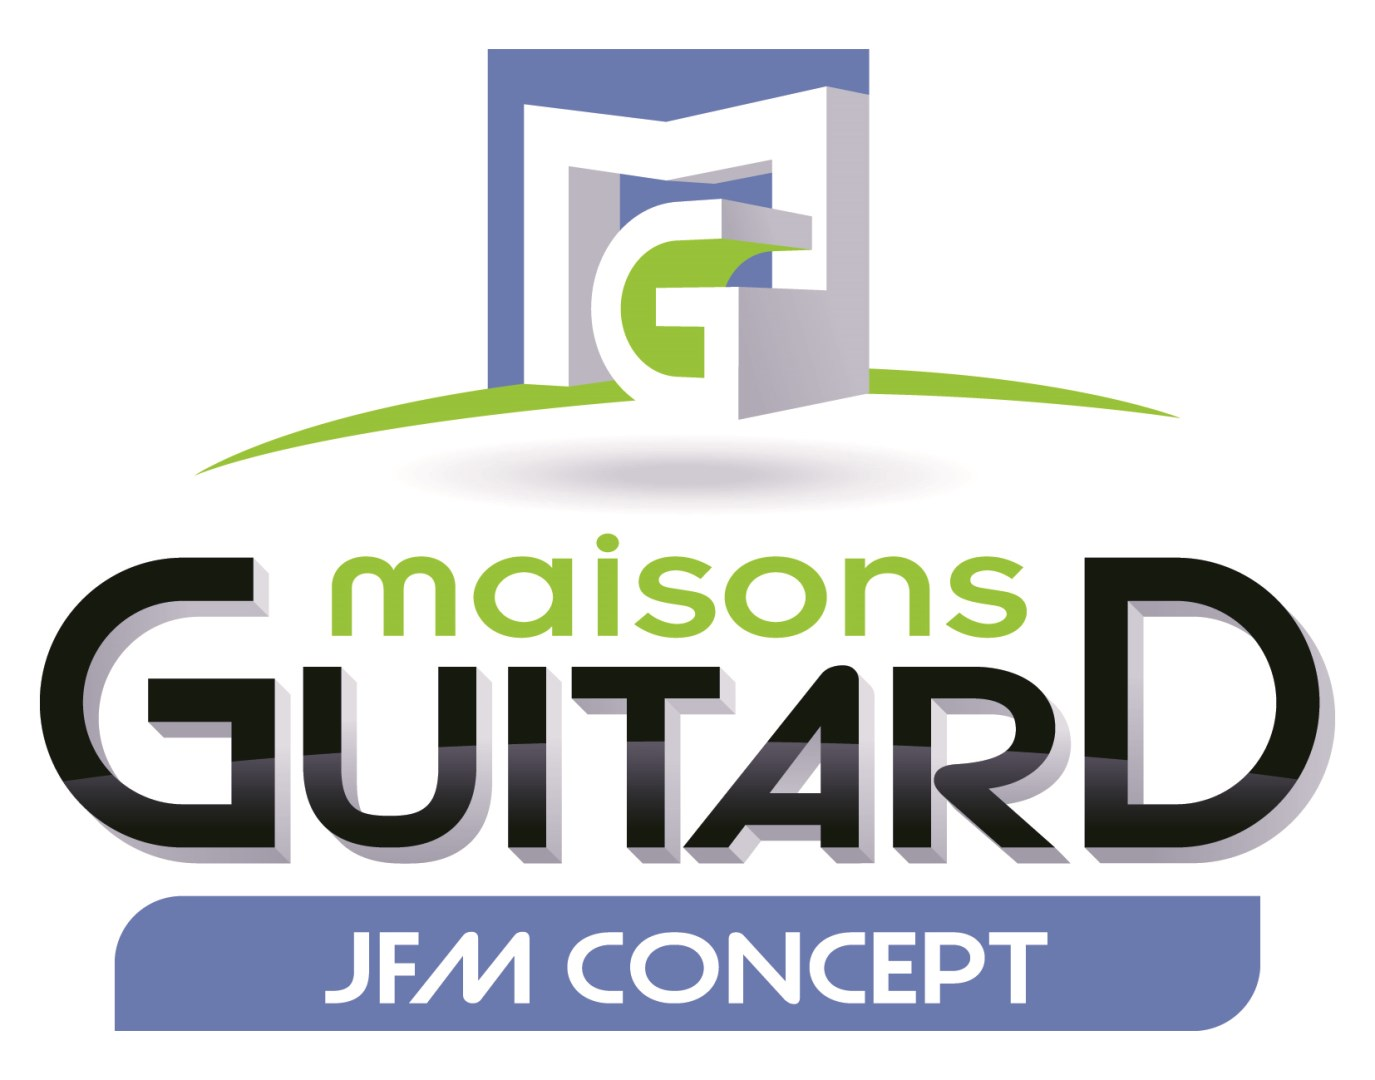 MAISONS GUITARD